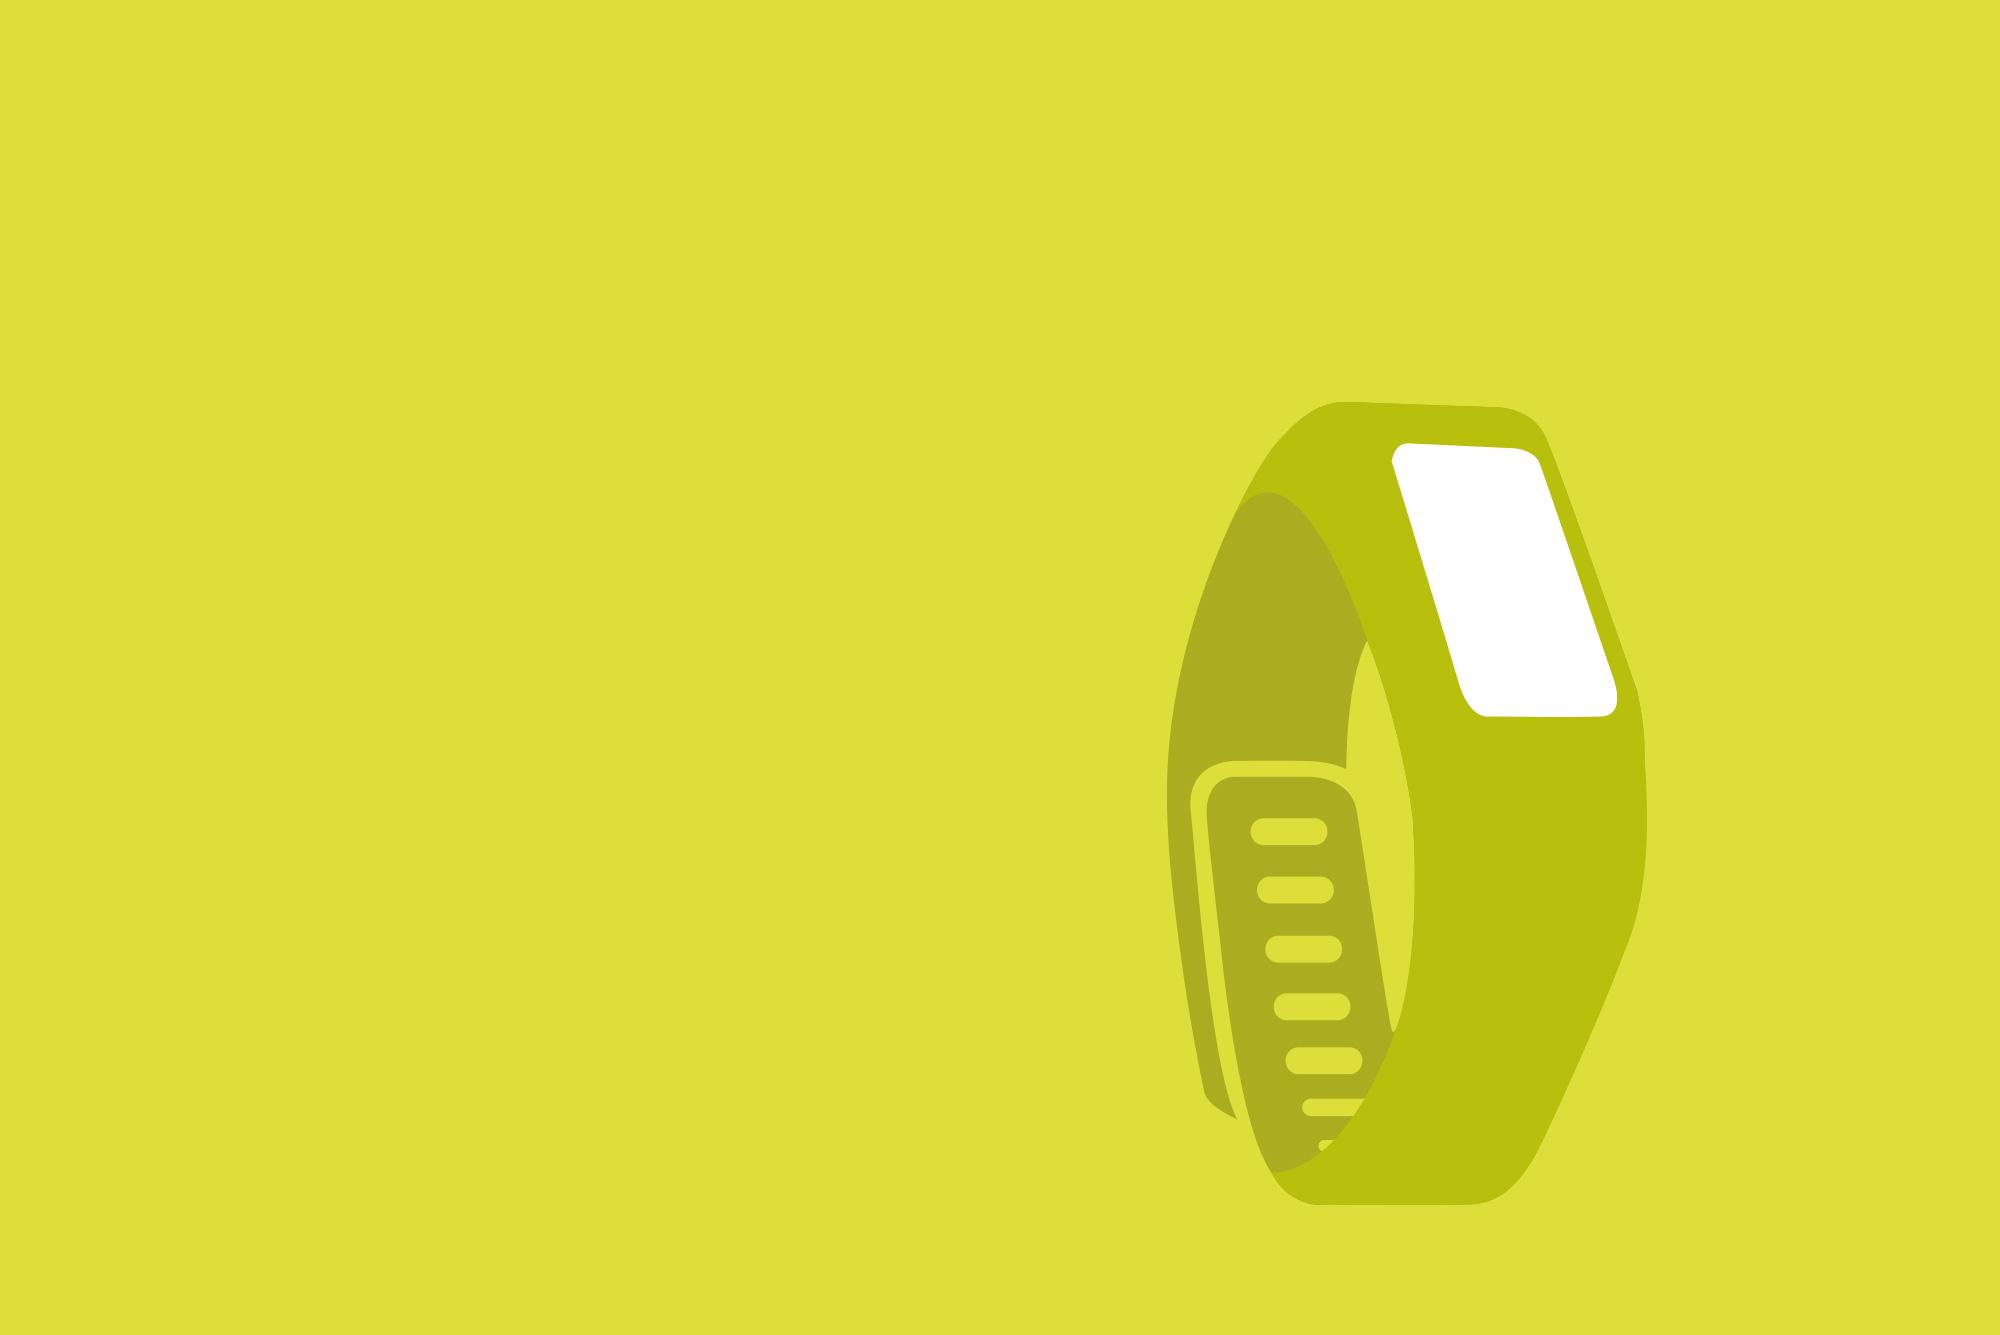 Smart watch on yellow background - Wearable tech